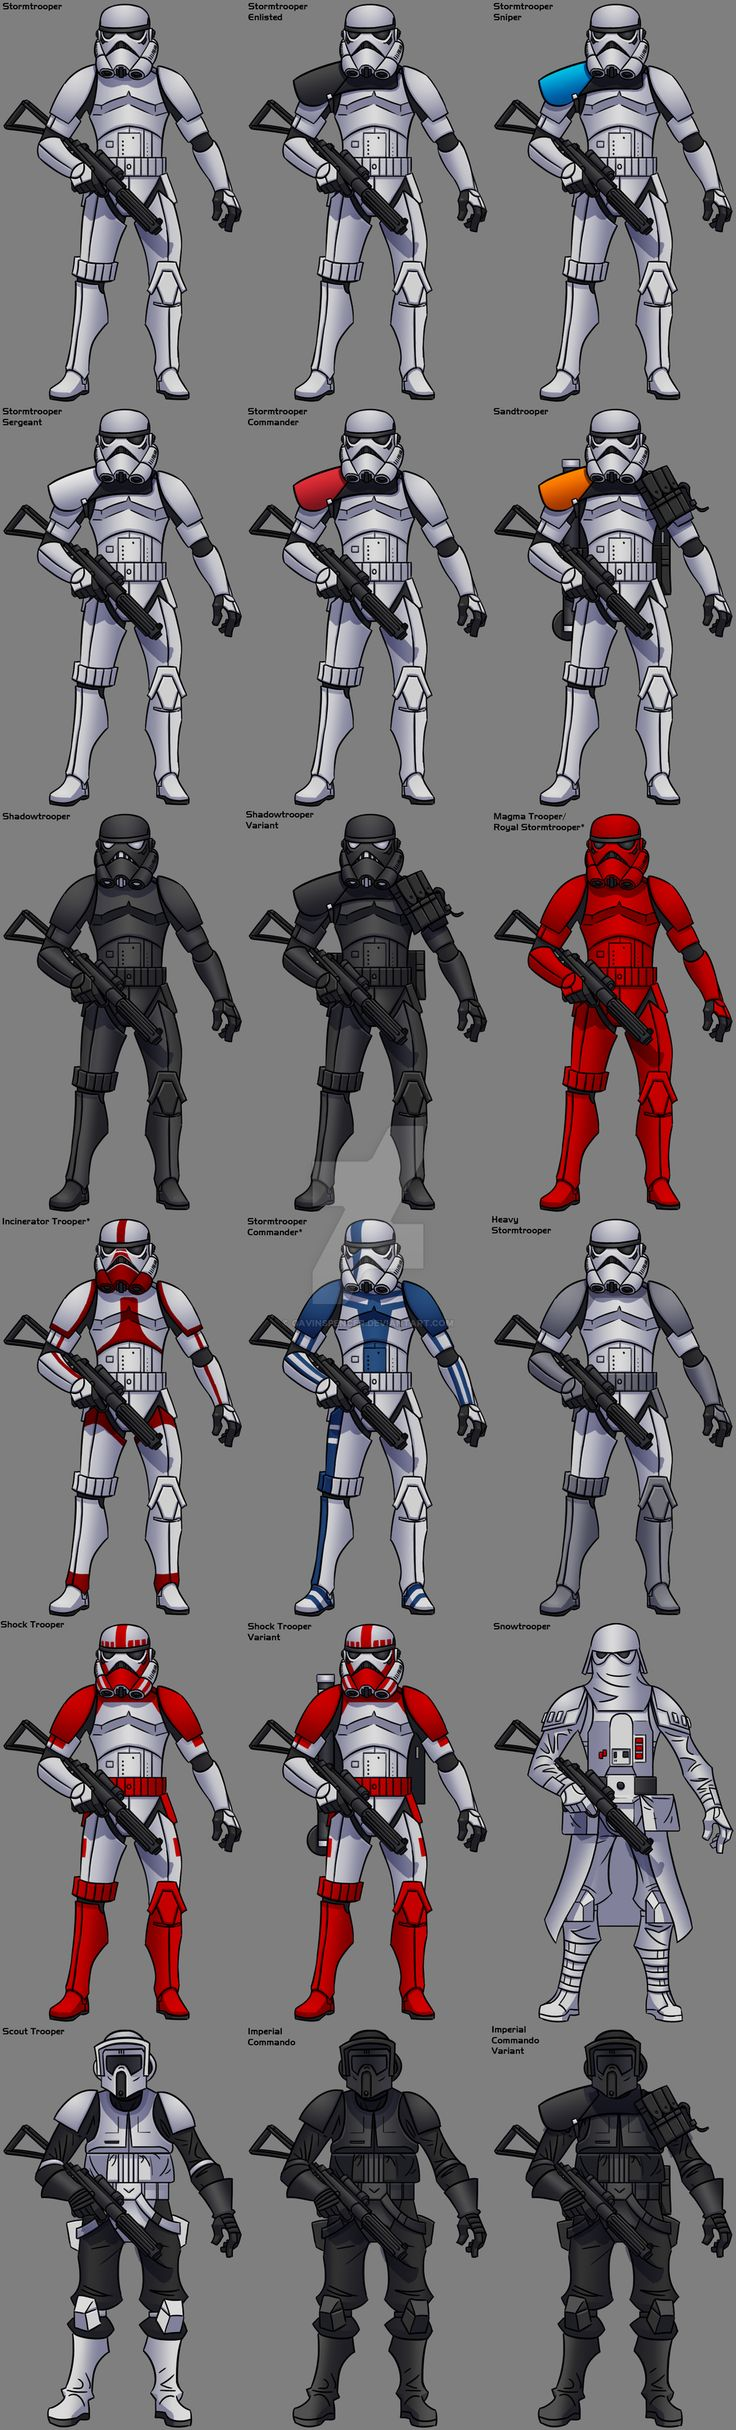 Imperial Military Variants by GavinSpencer on DeviantArt